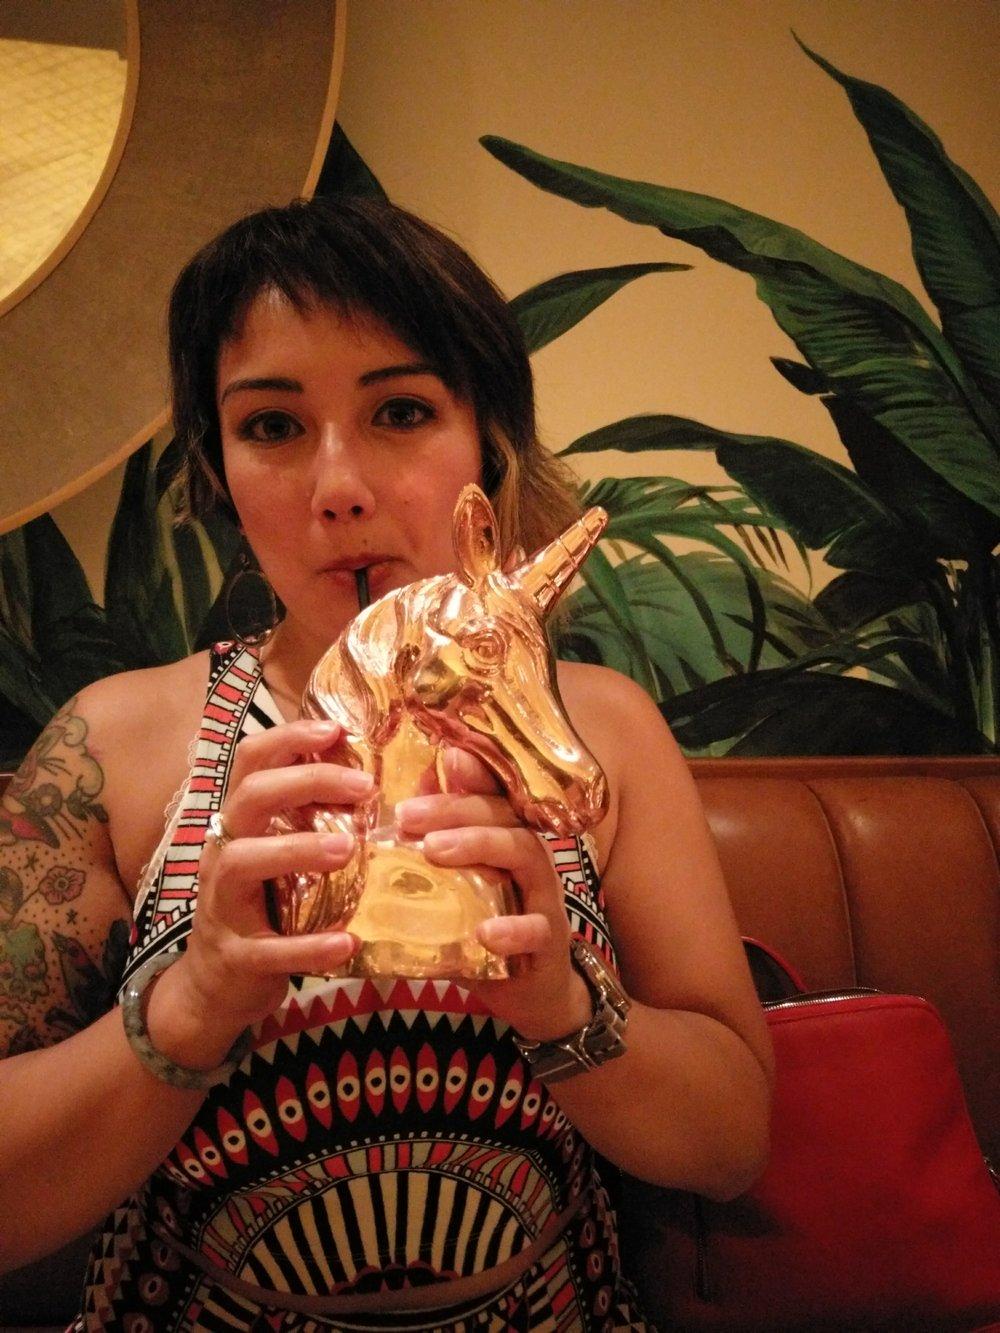 Katie Naka - I drink your unicorn. I drink it up.